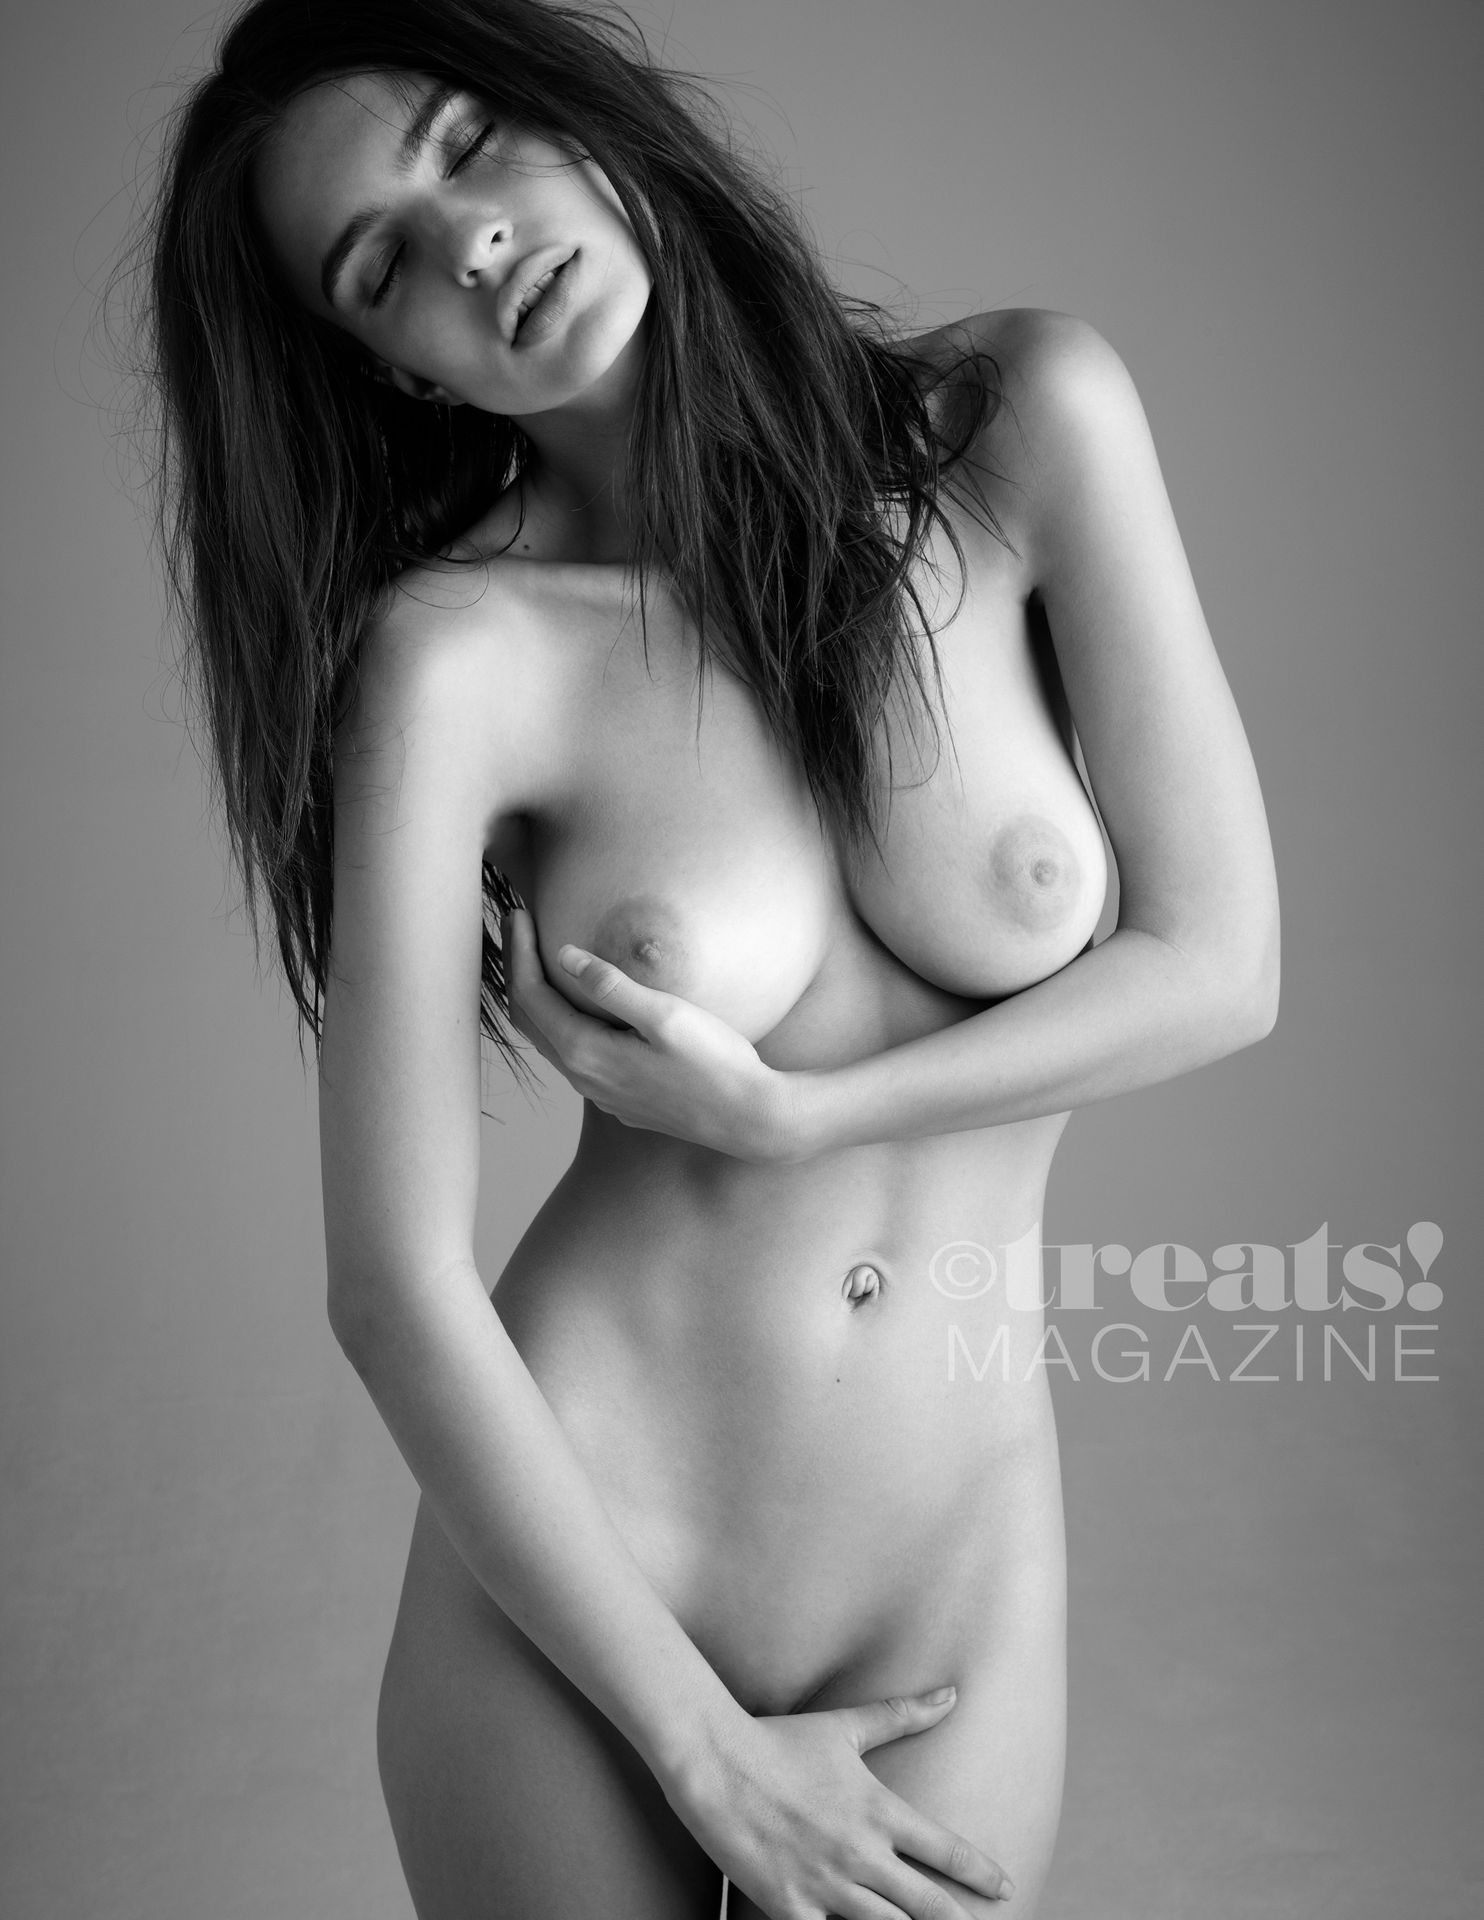 Emily-Ratajkowski-Nude-The-Fappening-Blog-3